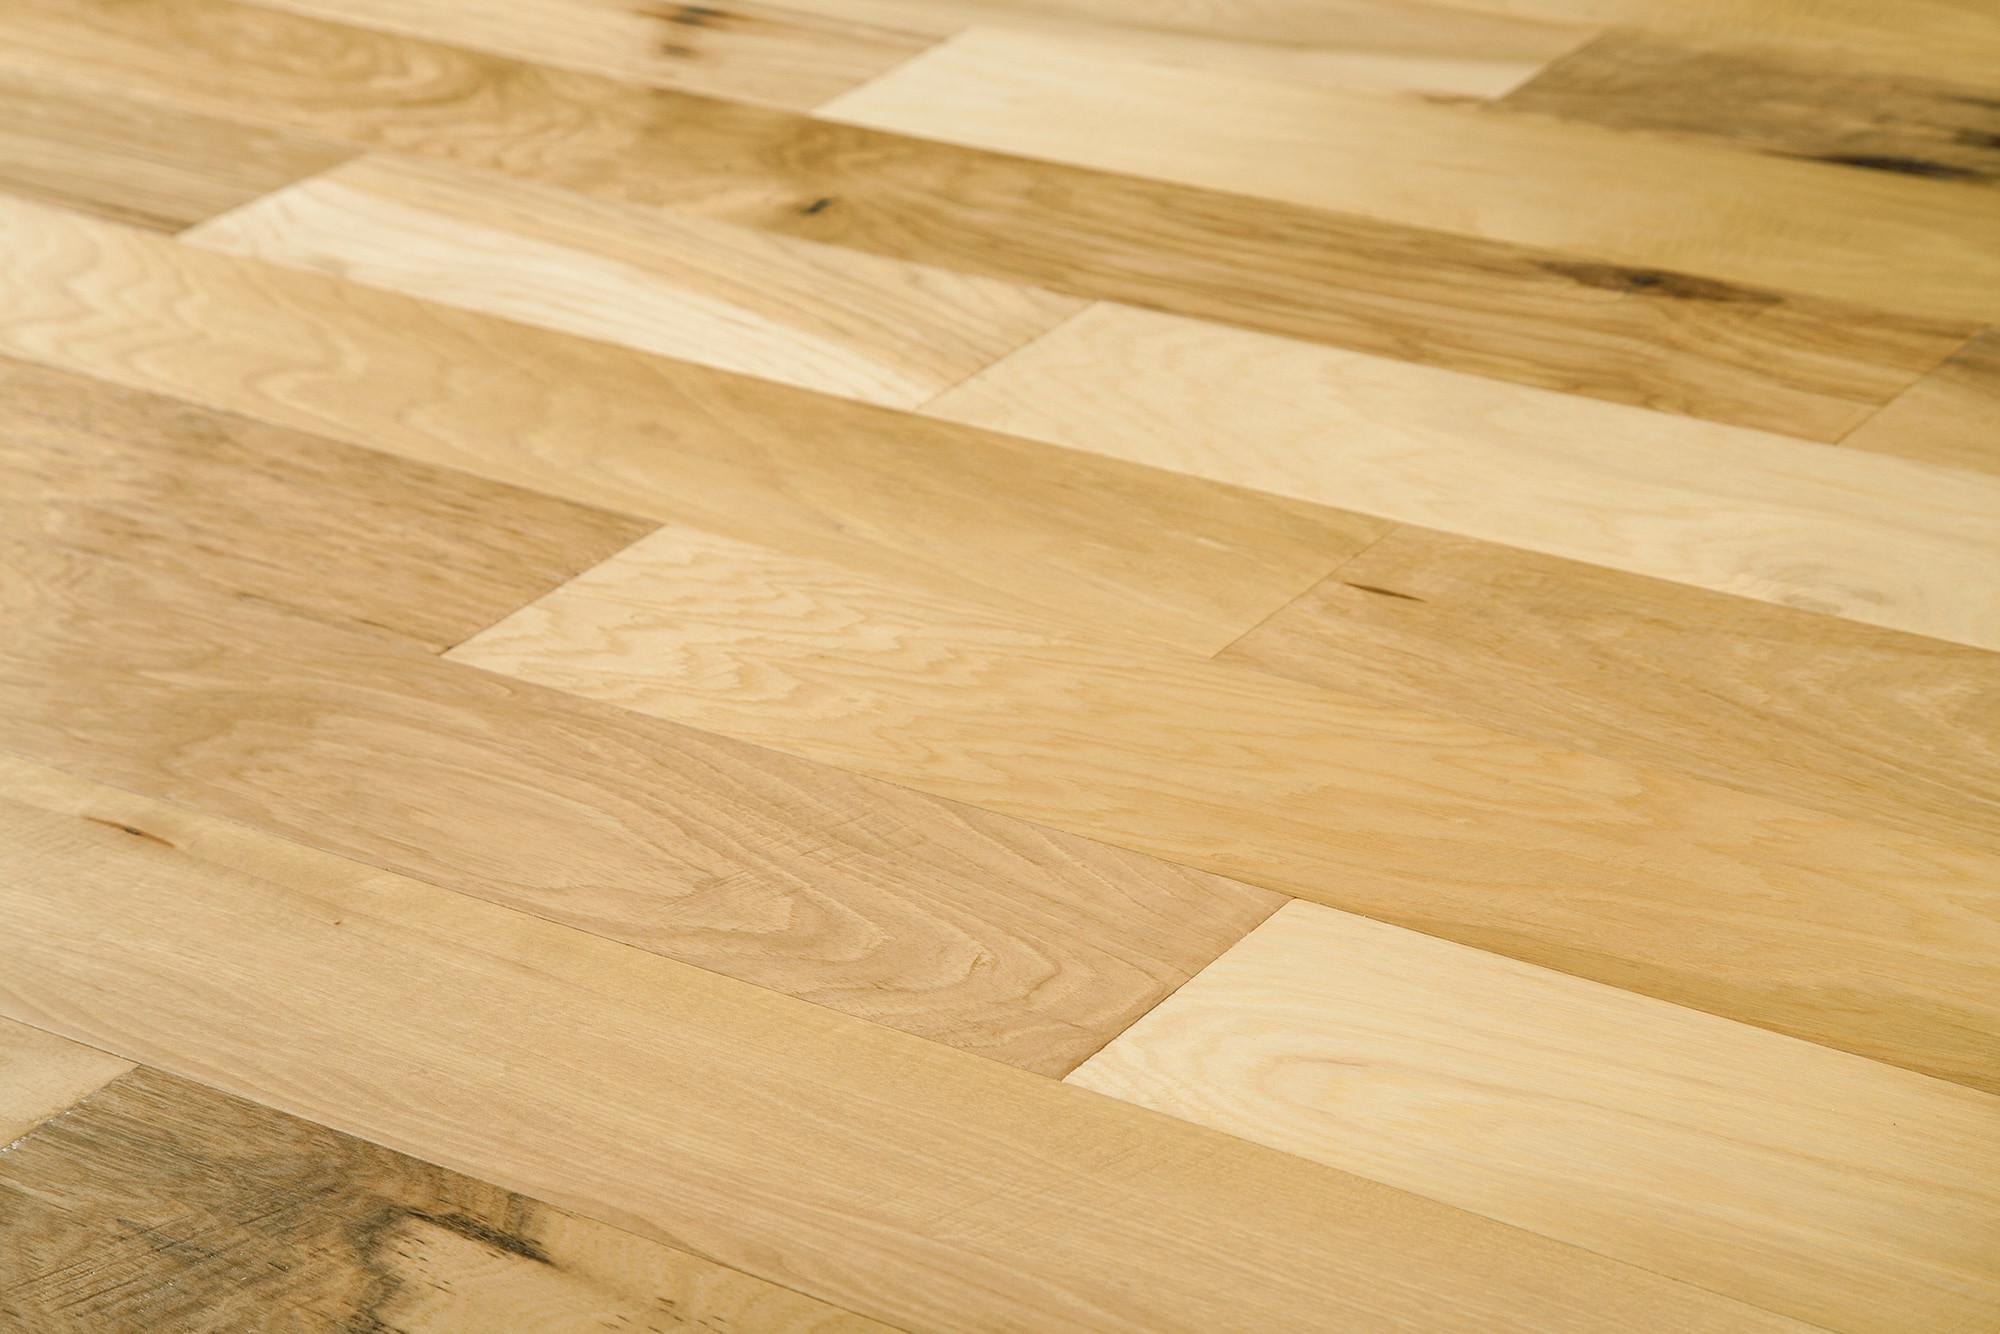 hardwood floor cleaning with white vinegar of cleaning hardwood floors with vinegar hardwood floor cleaning wood intended for cleaning hardwood floors with vinegar hardwood floor cleaning wood floor cleaner cleaning engineered